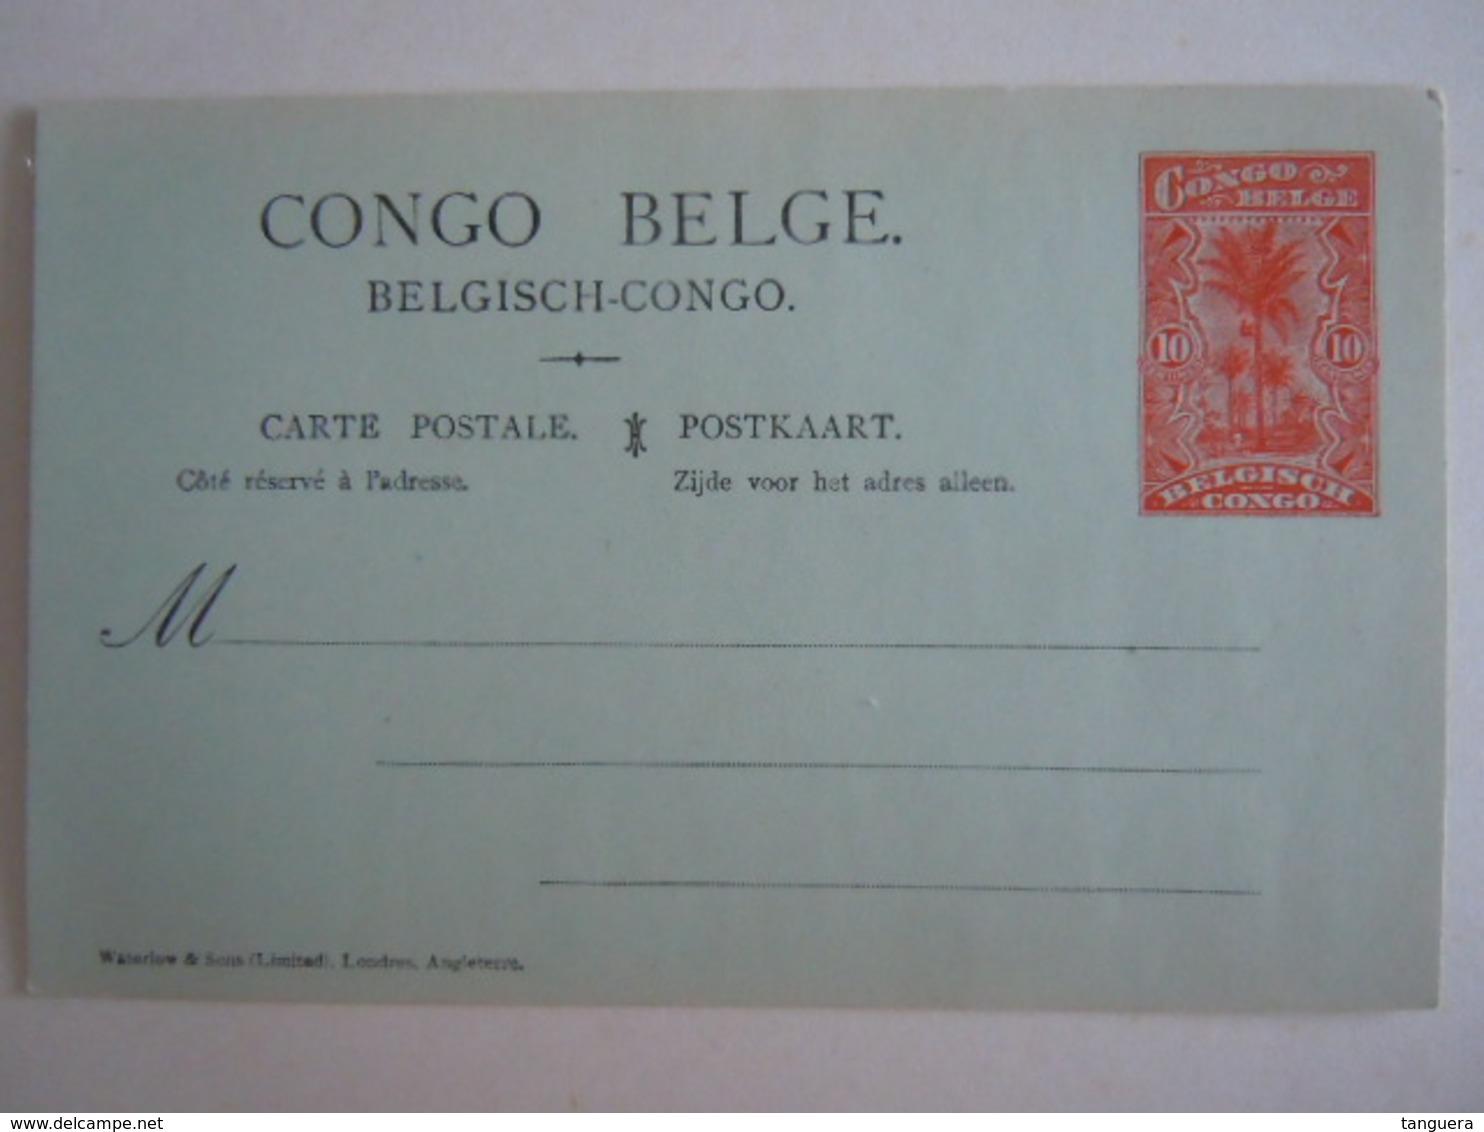 Congo Belge Belgische Congo Carte Postale Stationary Entier Postal 10 Centimes Palmiers - Ganzsachen